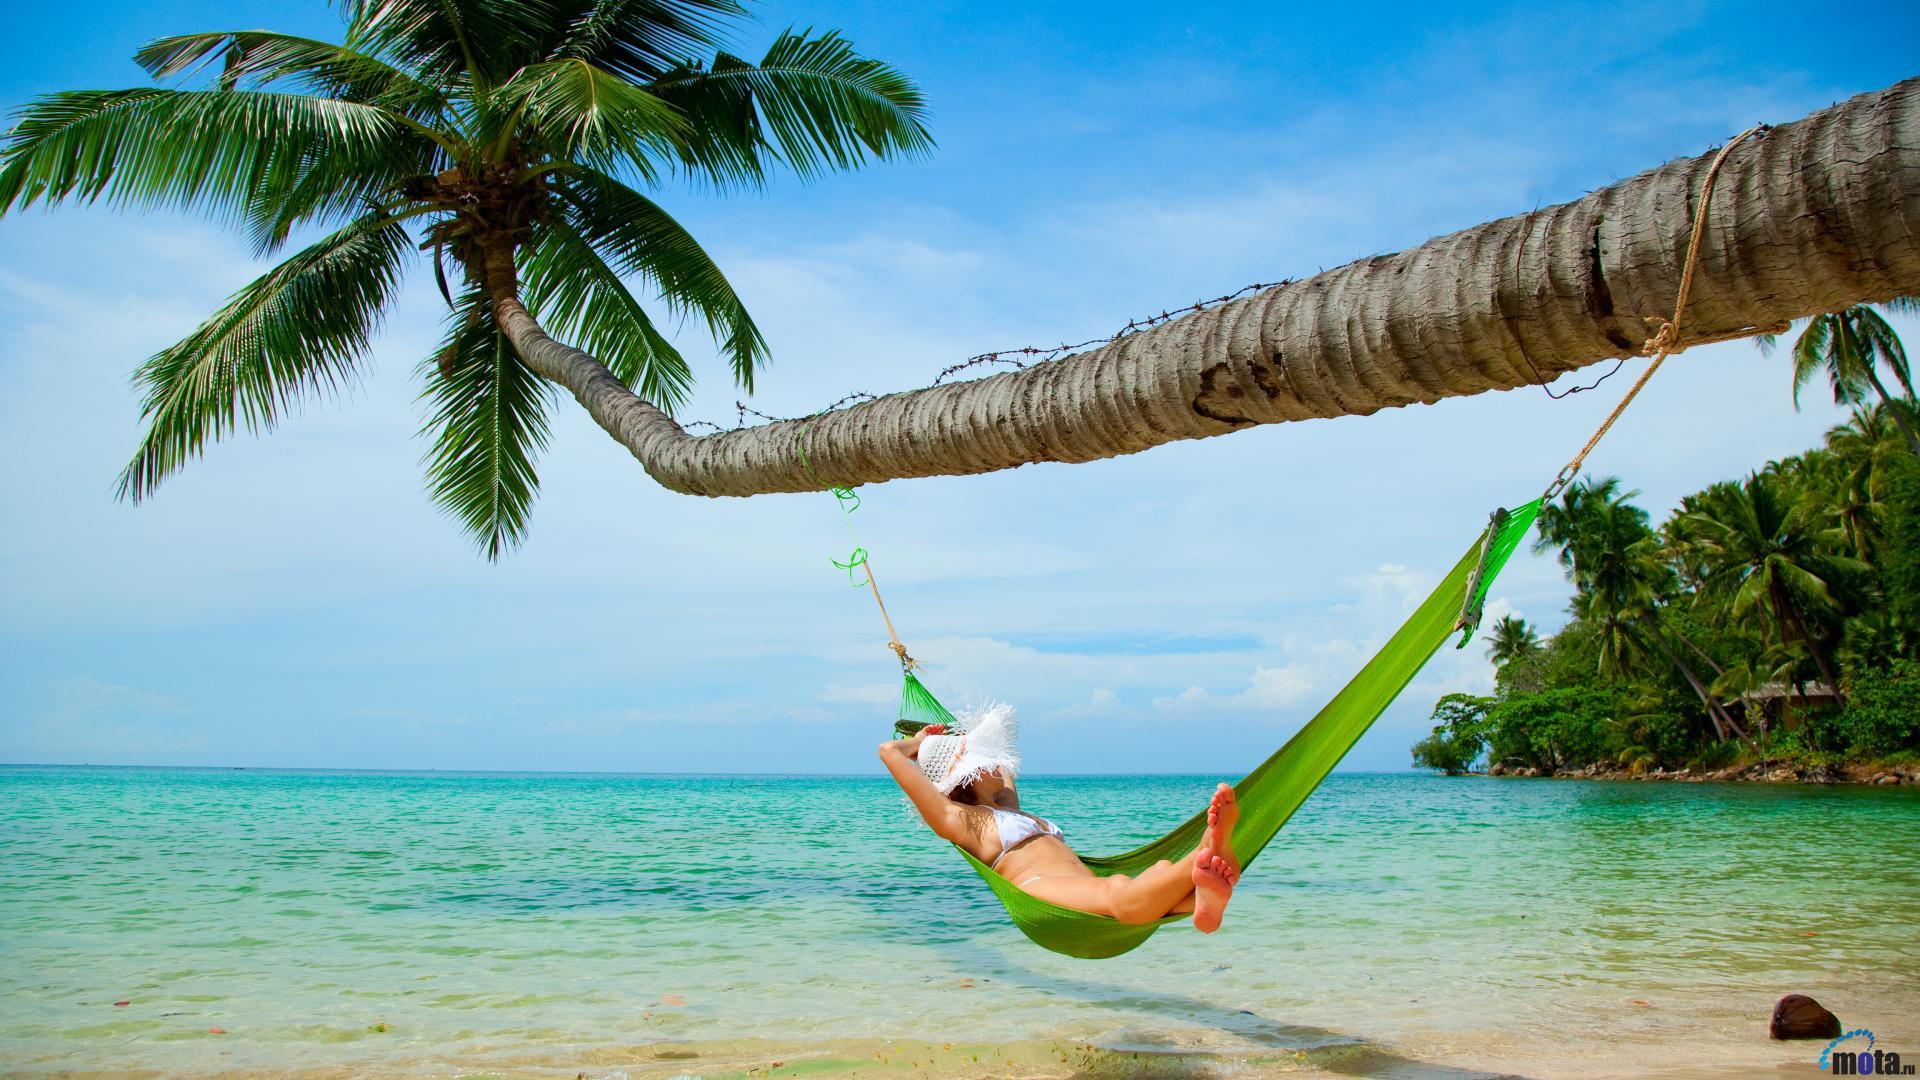 Tropical Drink On A Beach Wallpaper WallDevil